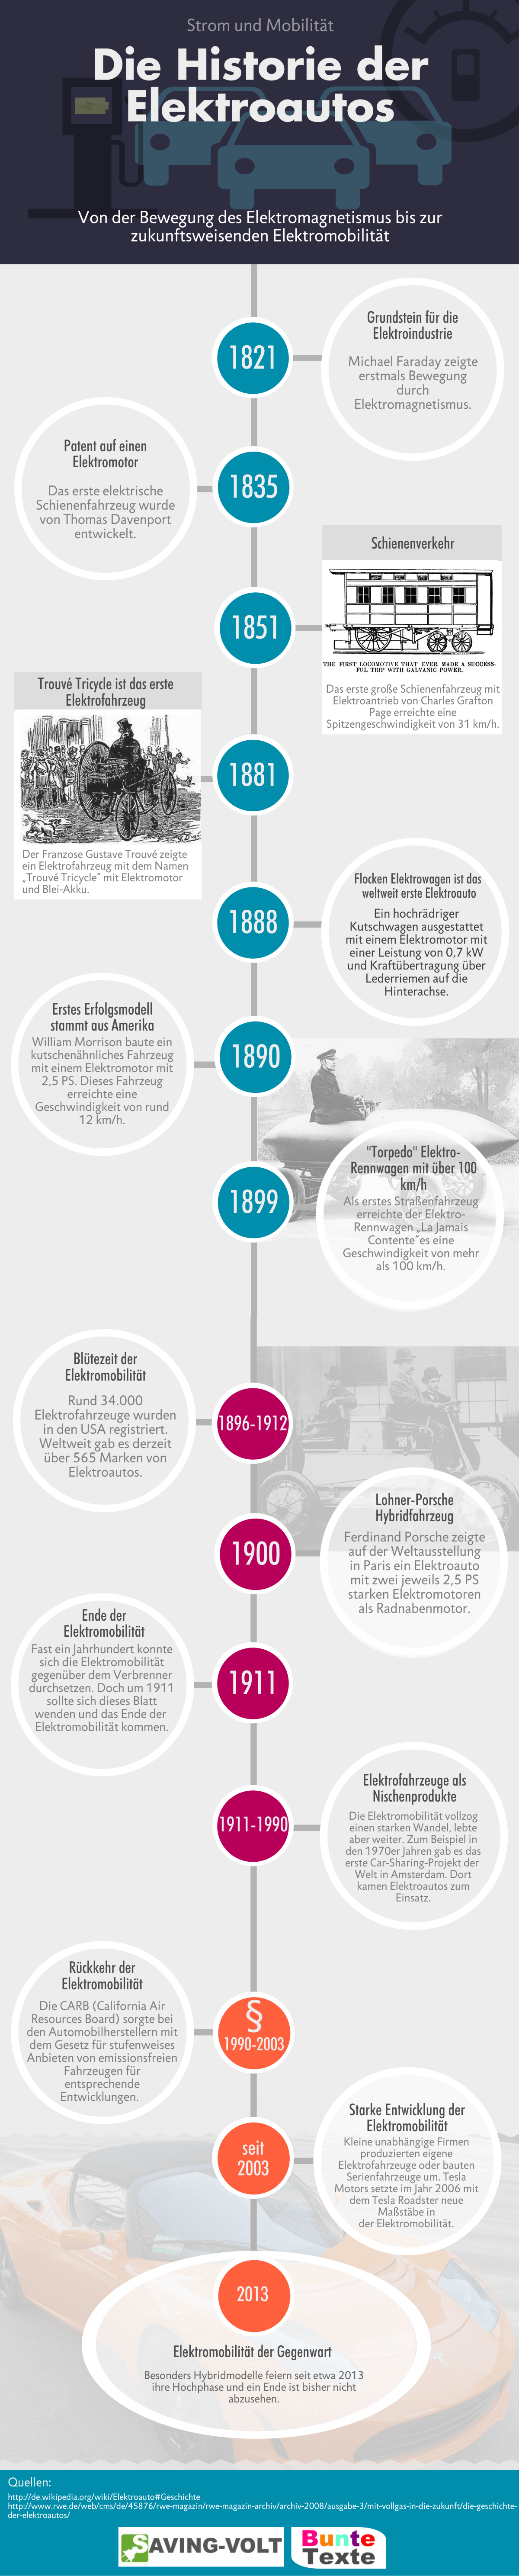 Geschichte des Elektroautos - Infografik